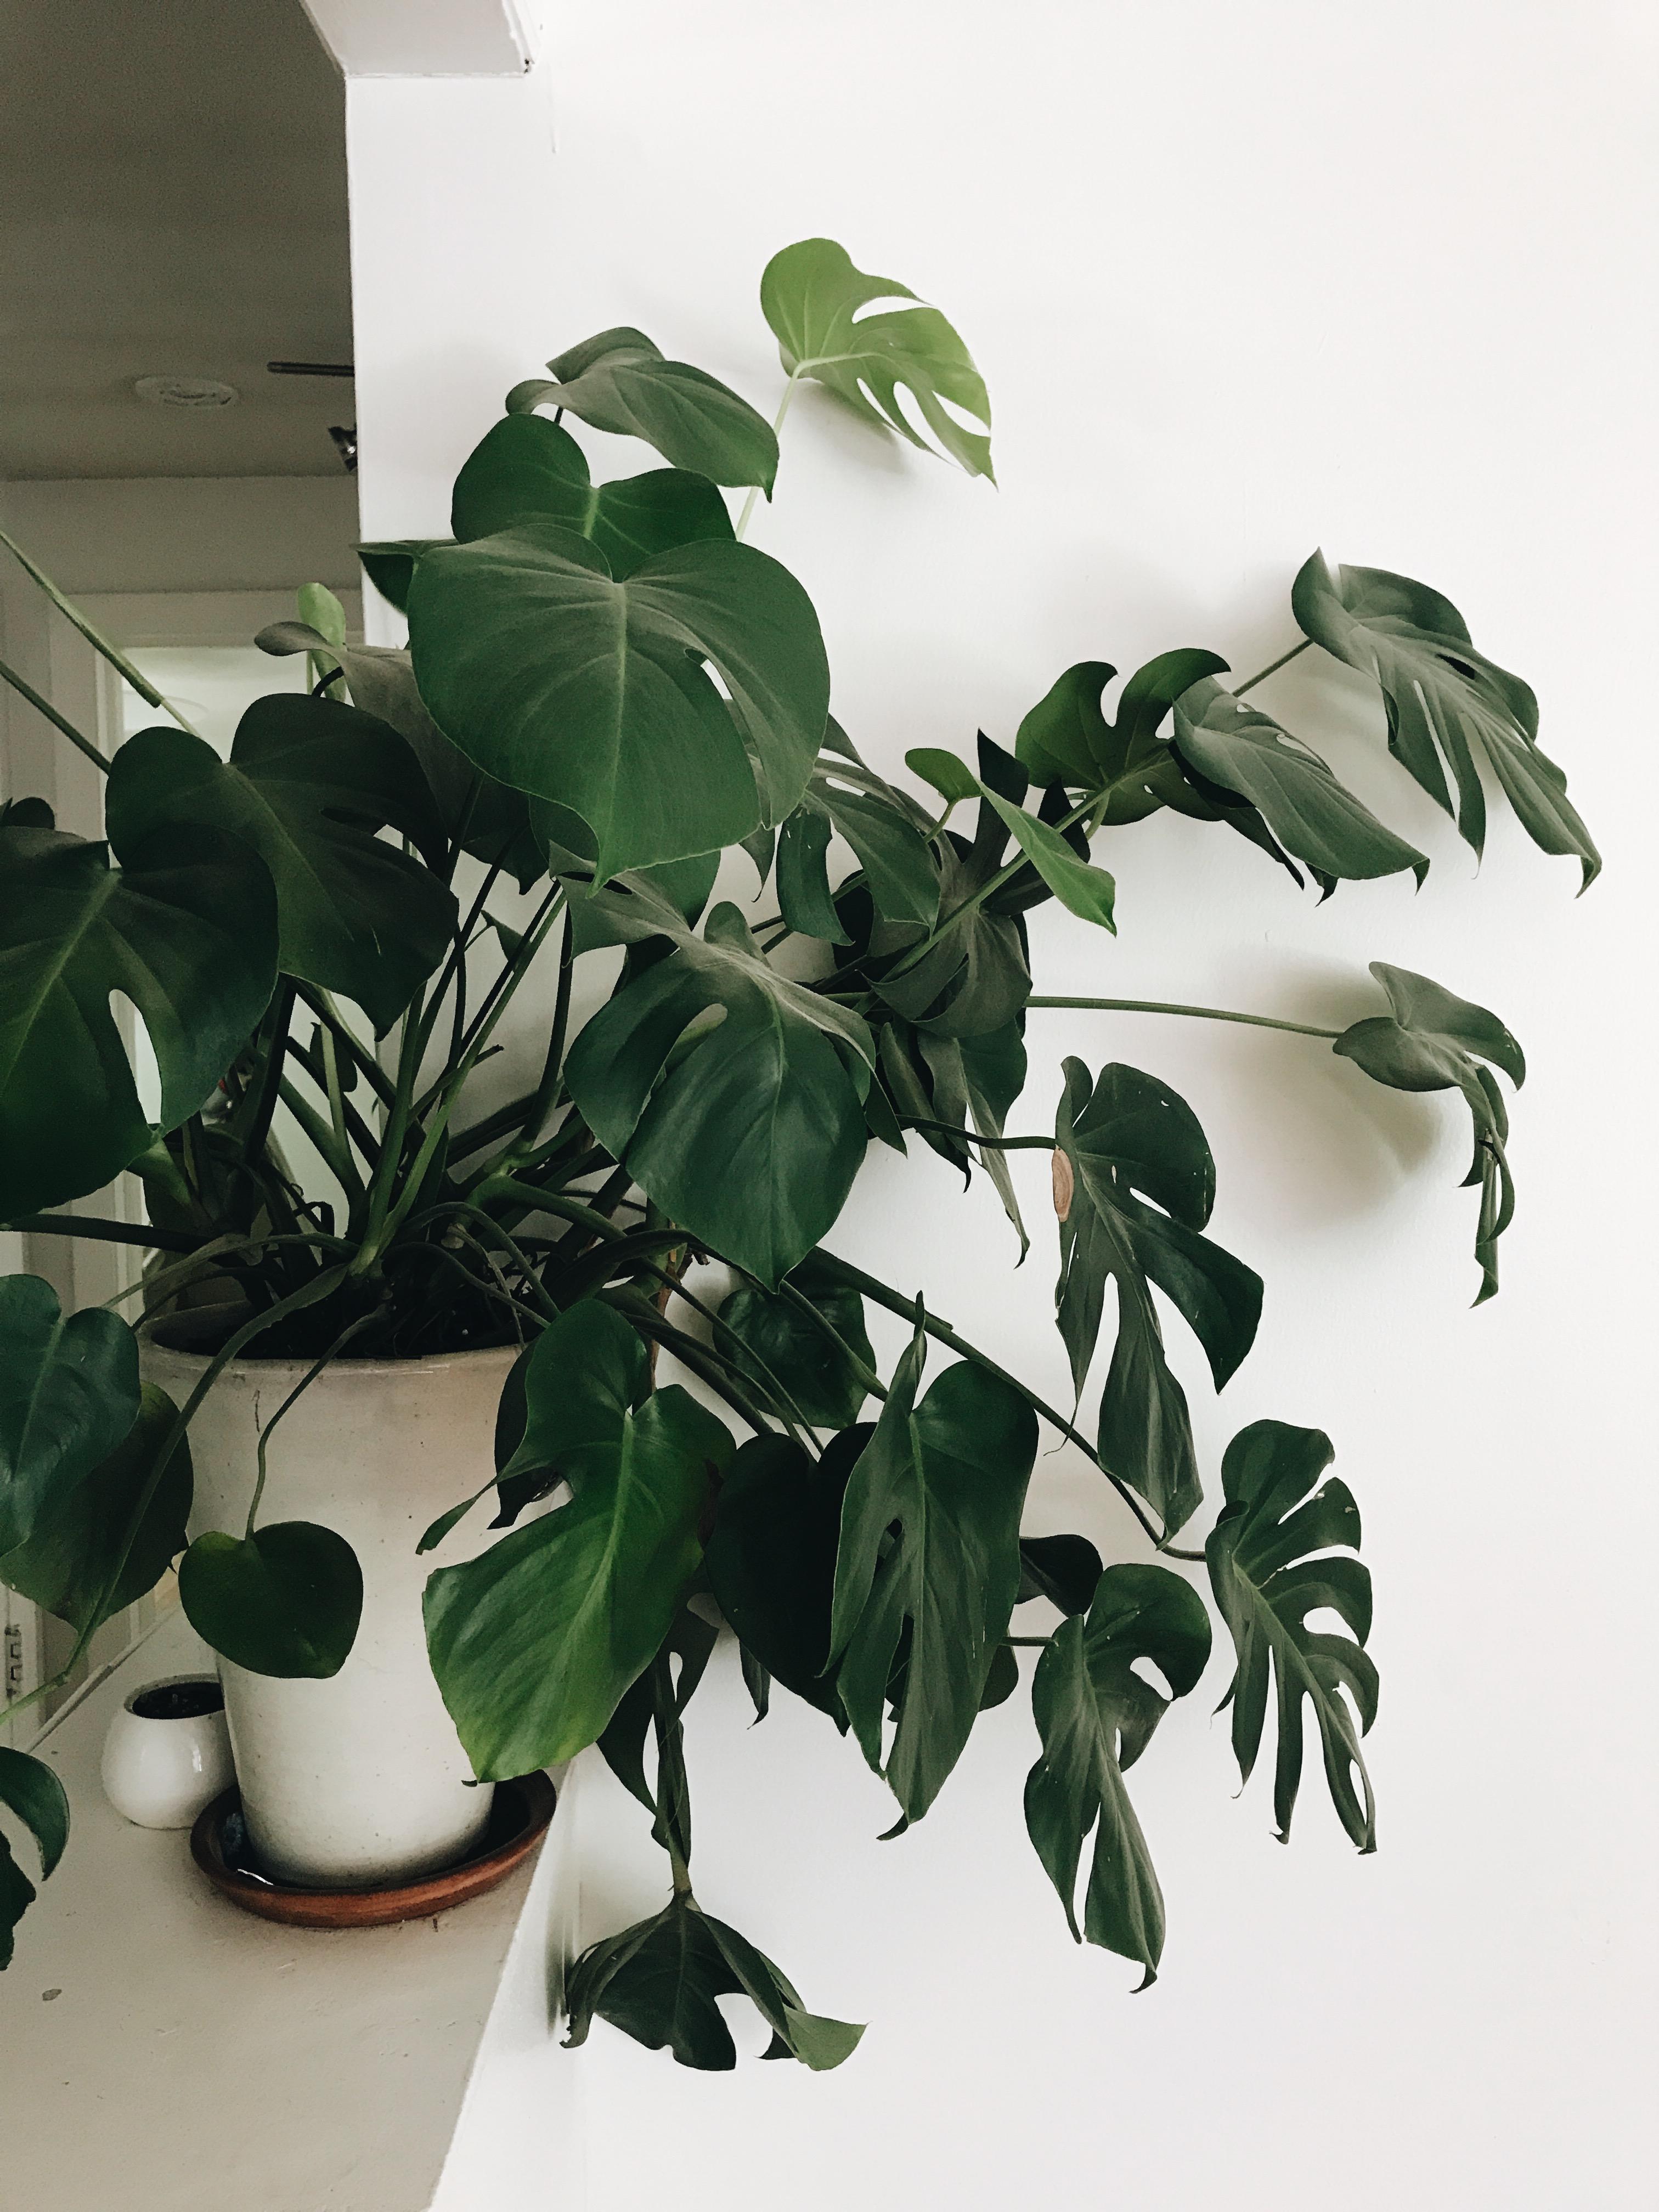 Weidner Houseplants / Bev Cooks